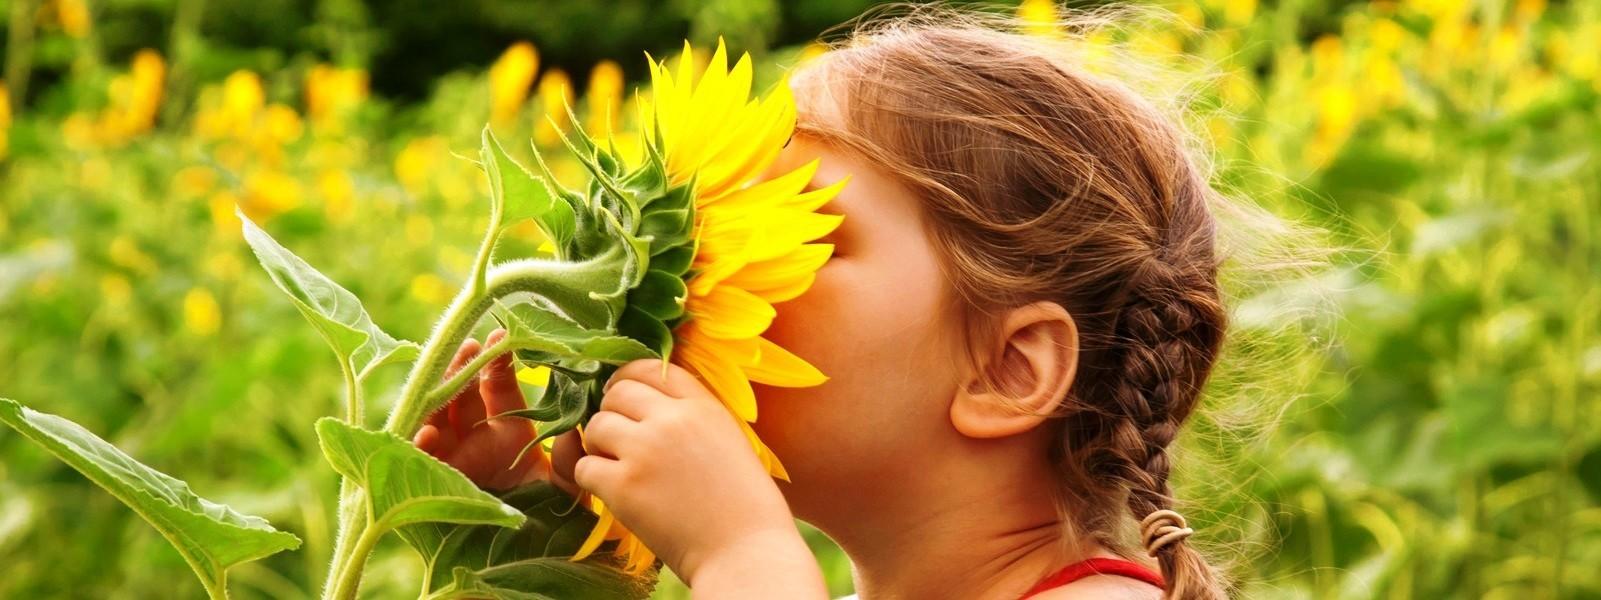 articole_child-smelling-flower.jpg